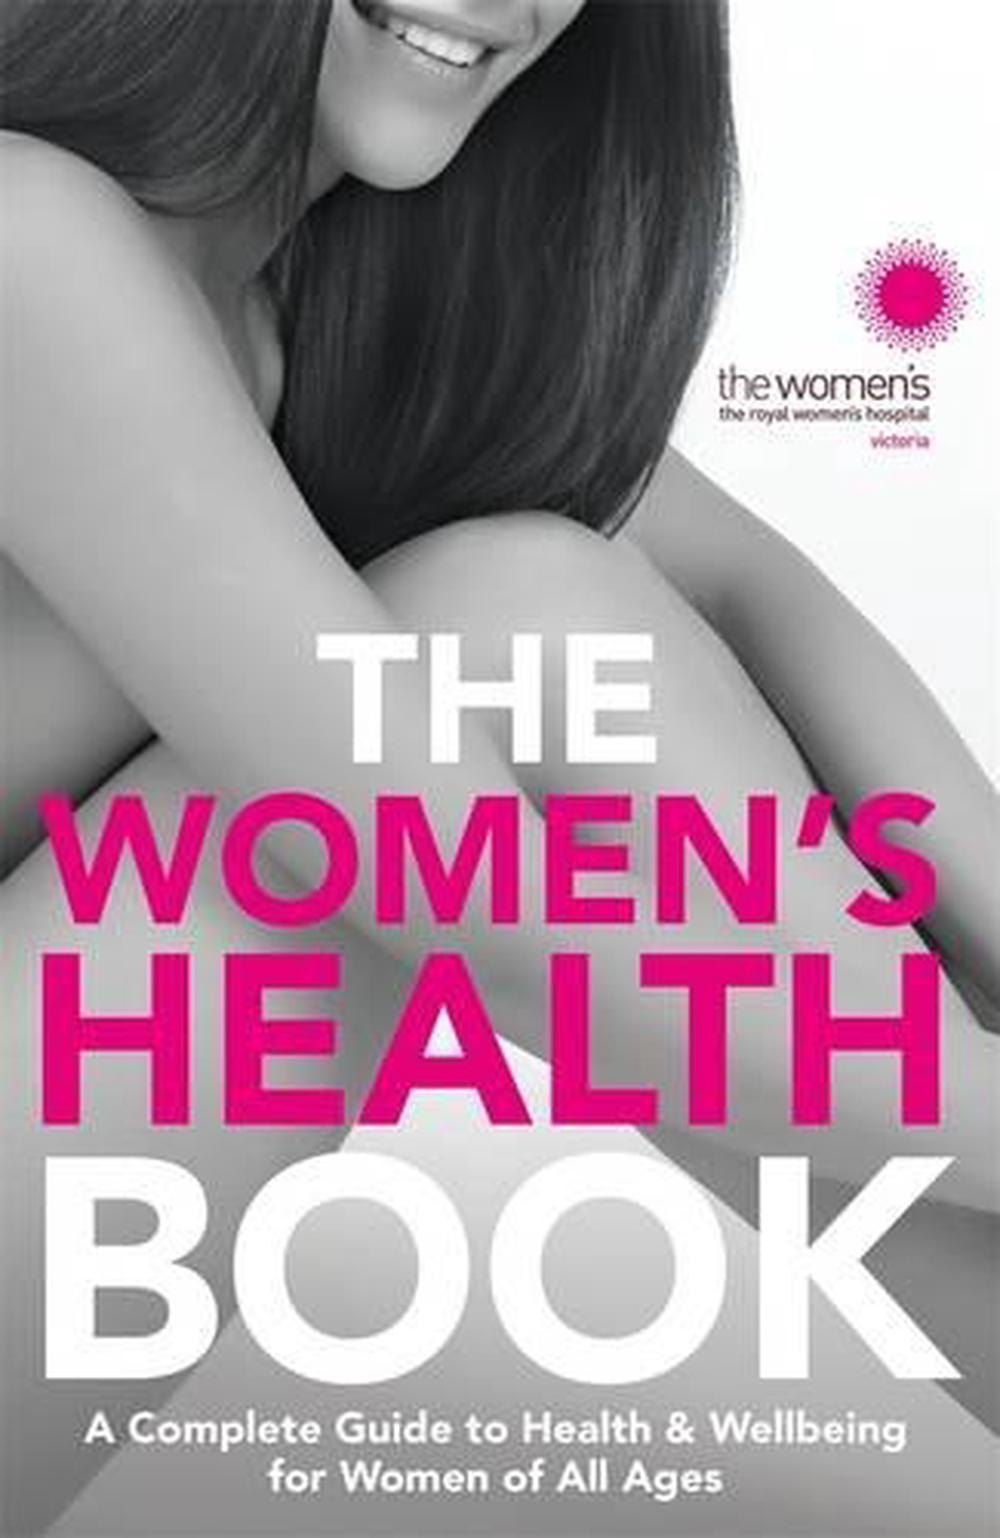 The Women's Health Book